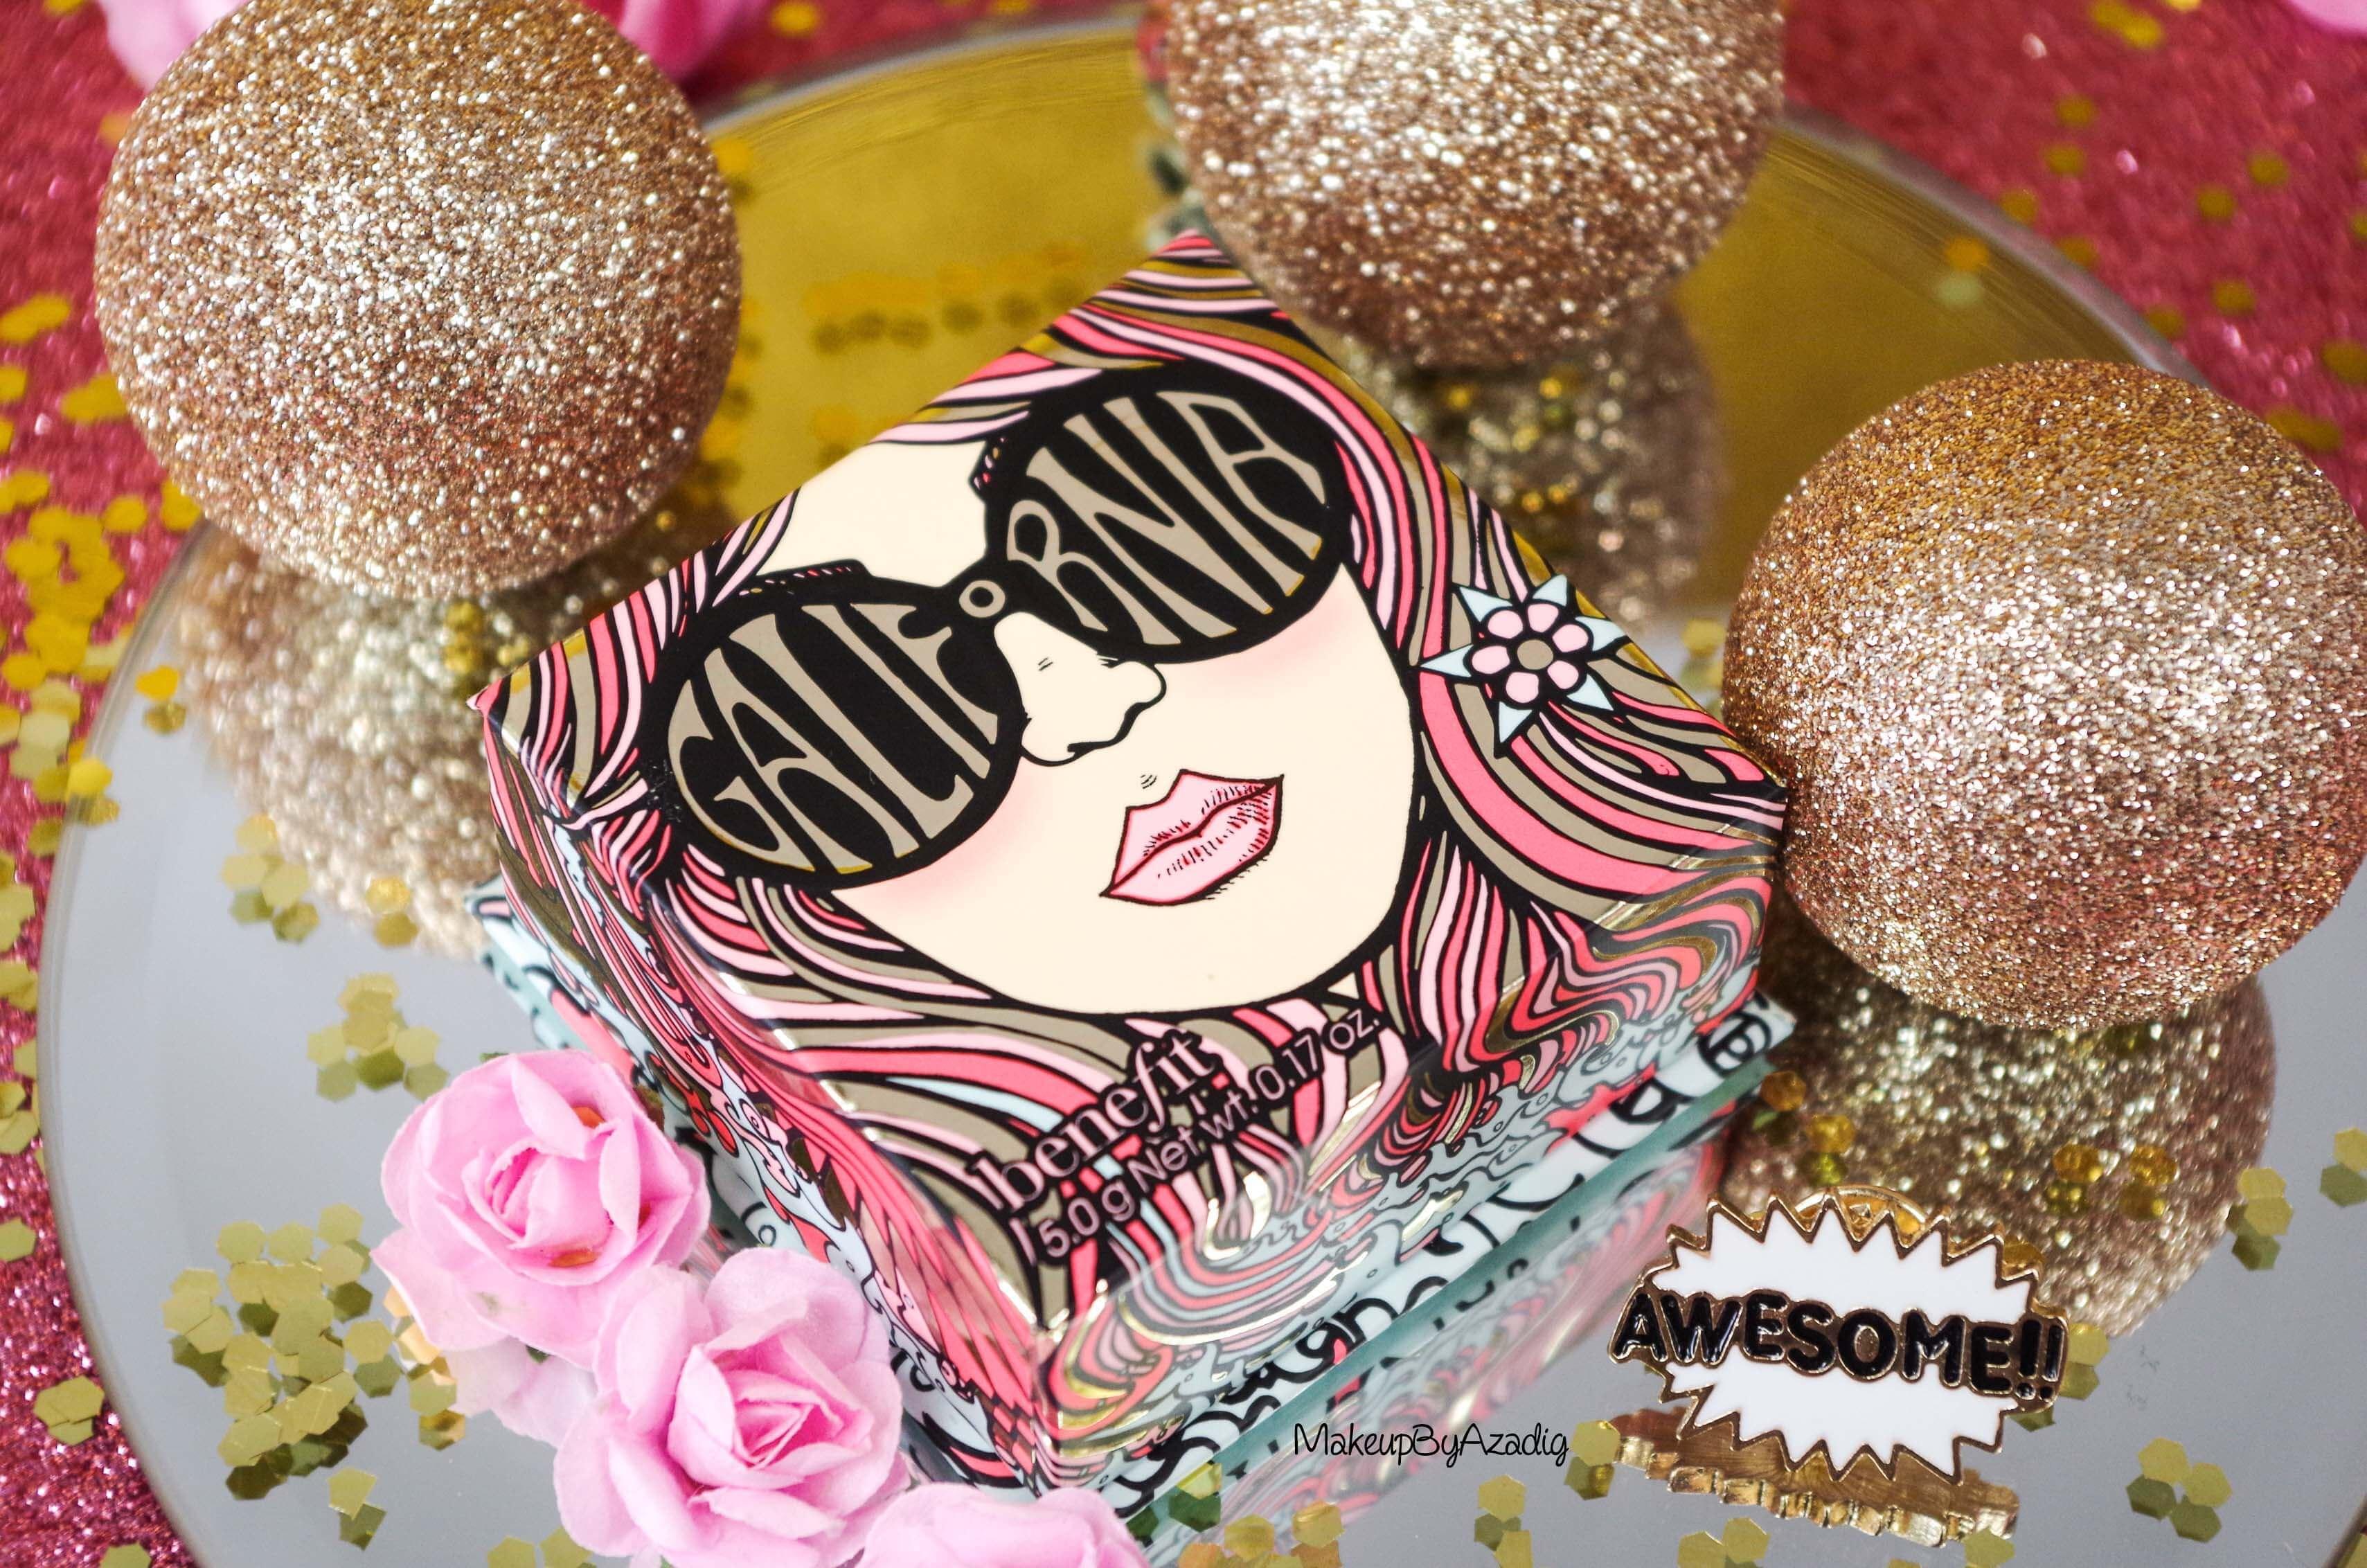 california-revue-review-blush-benefit-galifornia-san-francisco-sunny-golden-pink-blush-avis-prix-sephora-makeupbyazadig-coachella